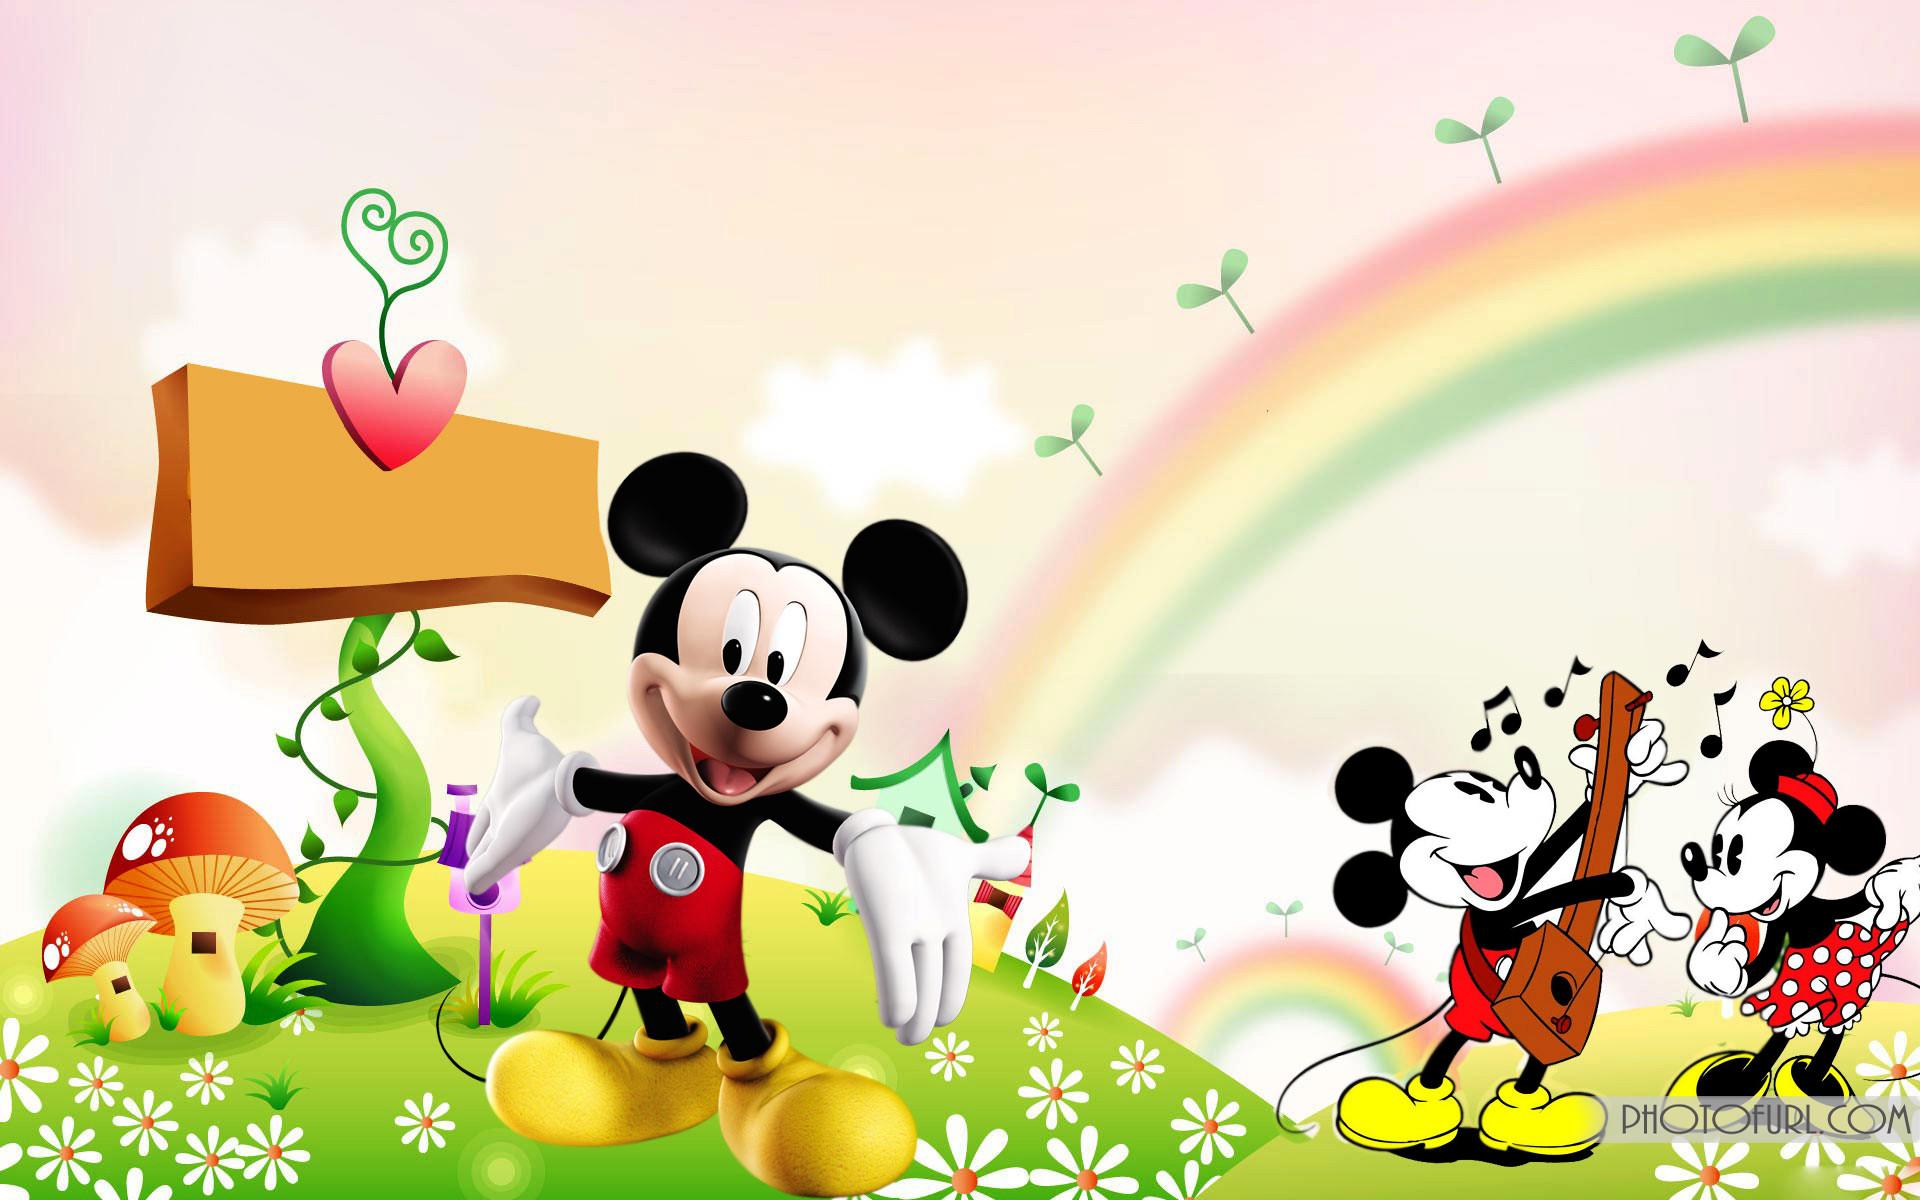 Cartoon Desktop Backgrounds 183 ① Wallpapertag